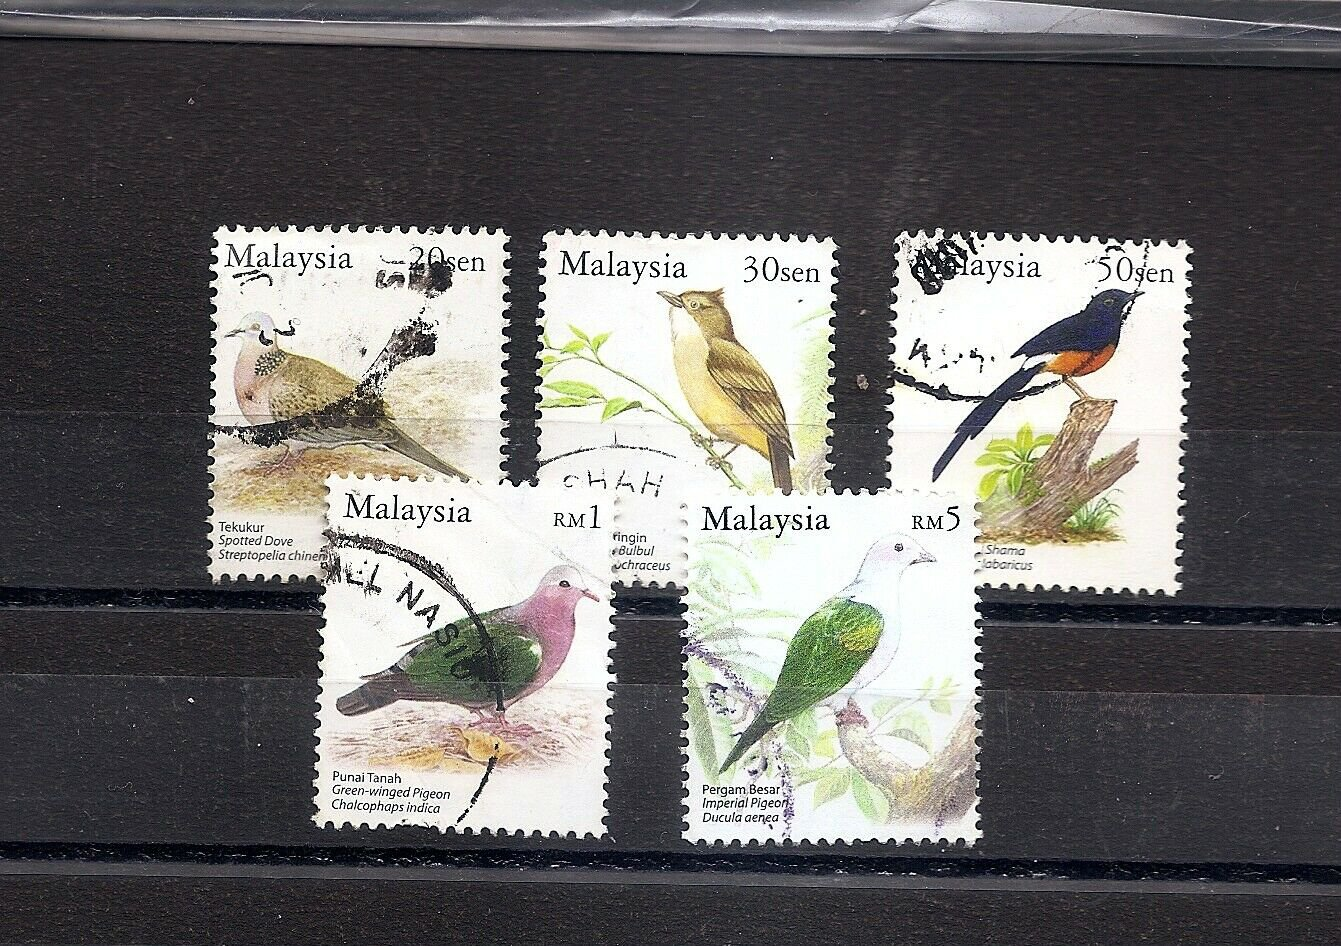 MALAYSIA  Birds - 2005 - Short set  Fine used